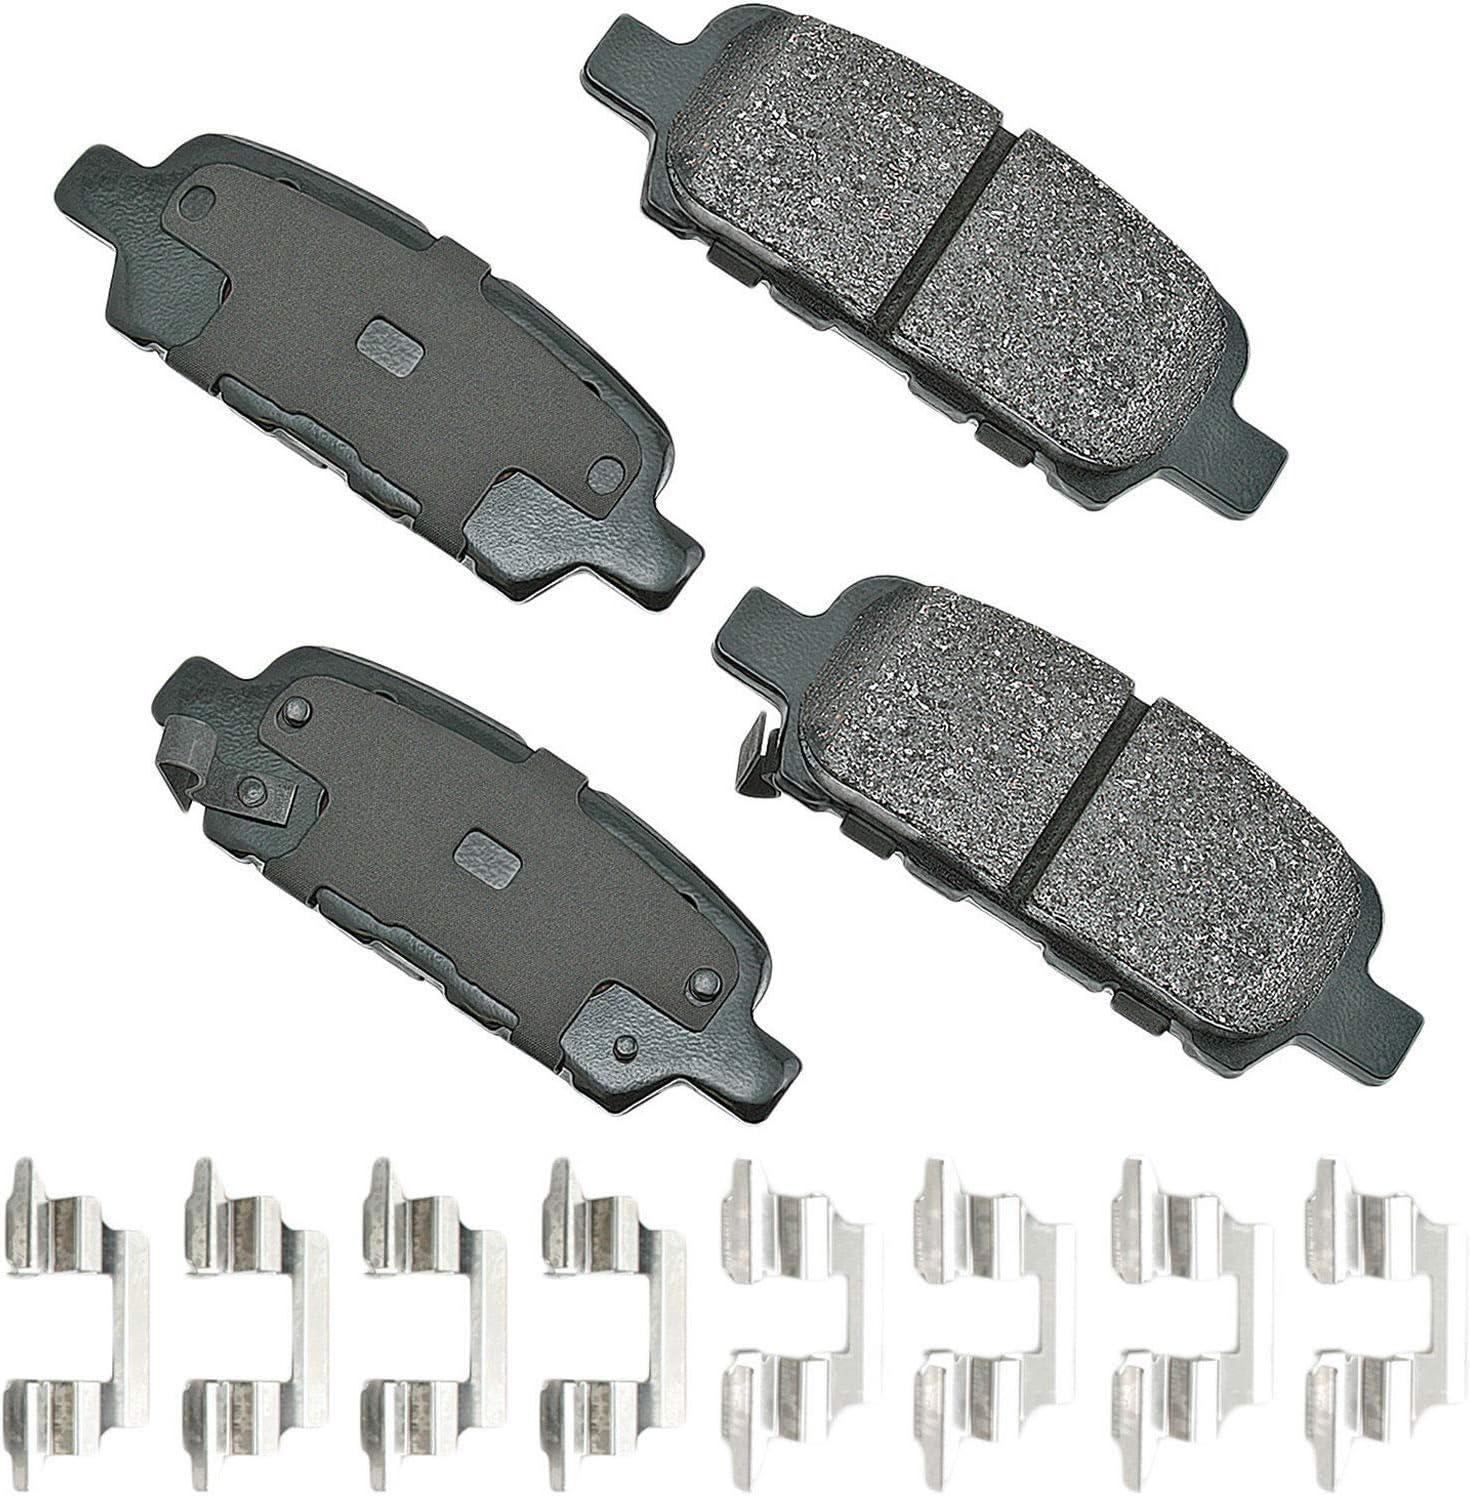 Akebono-ACT905A Ultra-Premium Ceramic Rear Disc Brake Pads